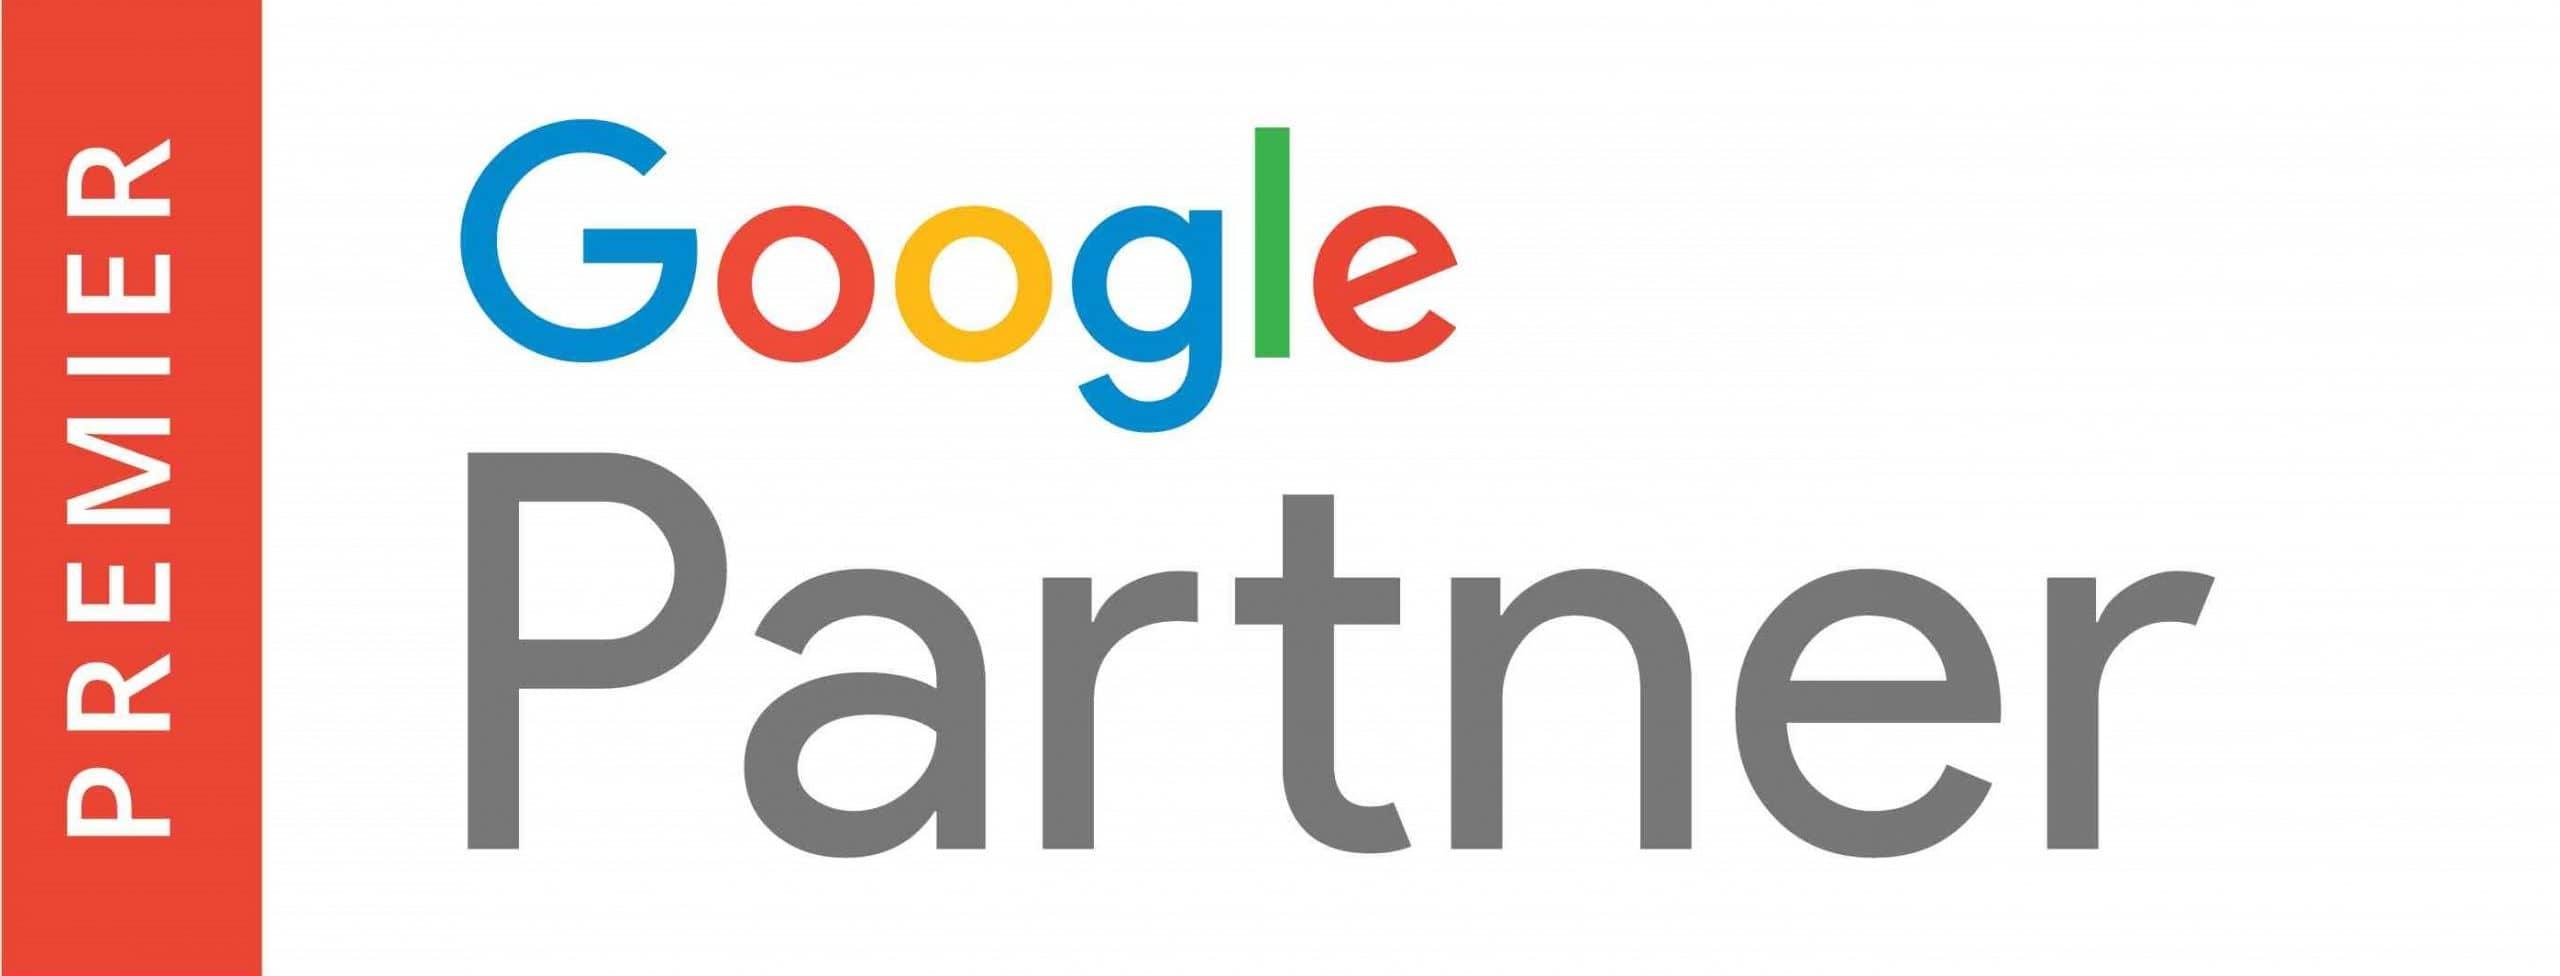 google partner seohizmeti